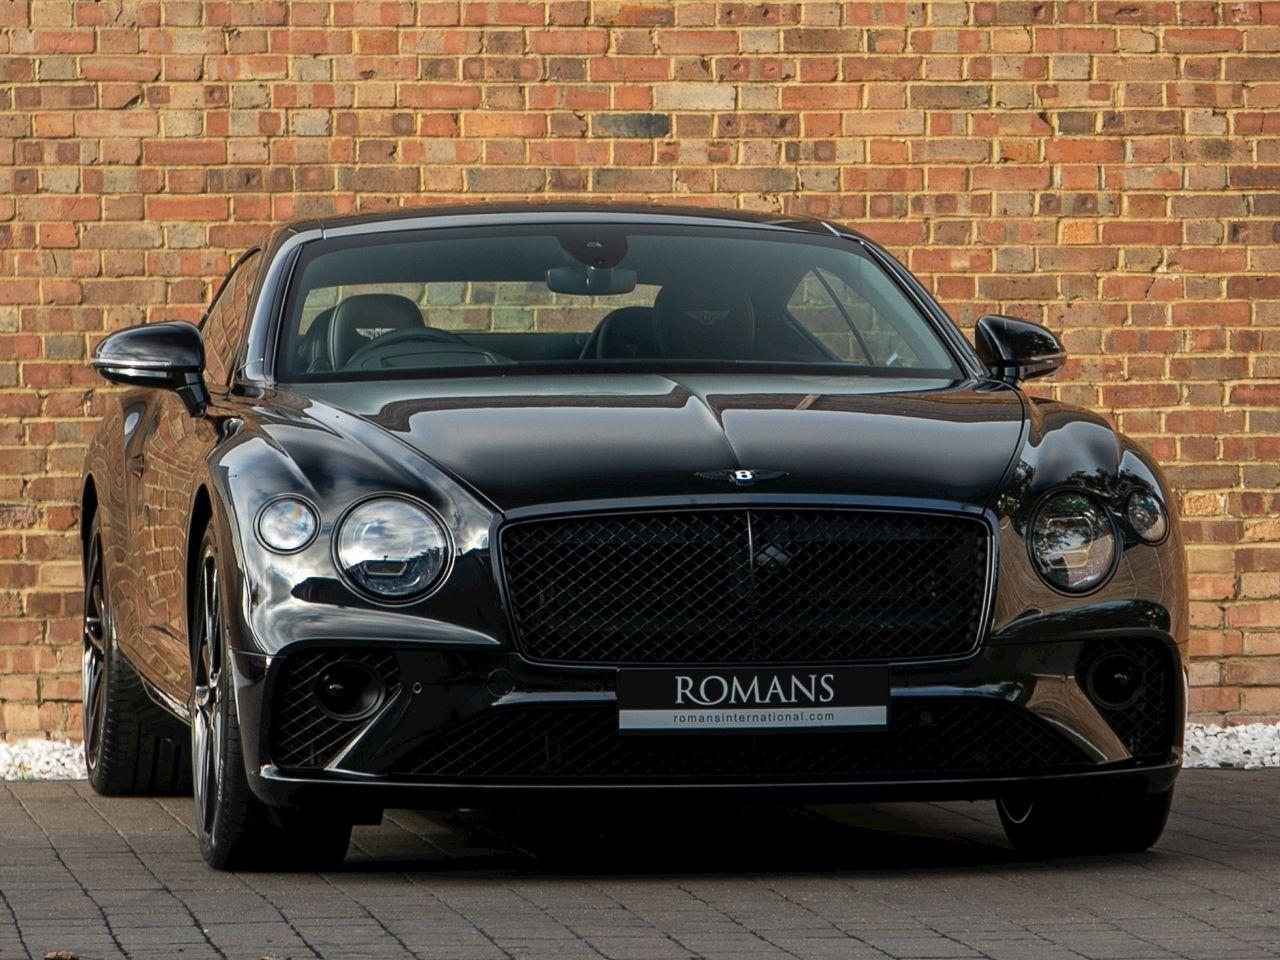 2018 Used Bentley Continental Gt Bentley continental gt